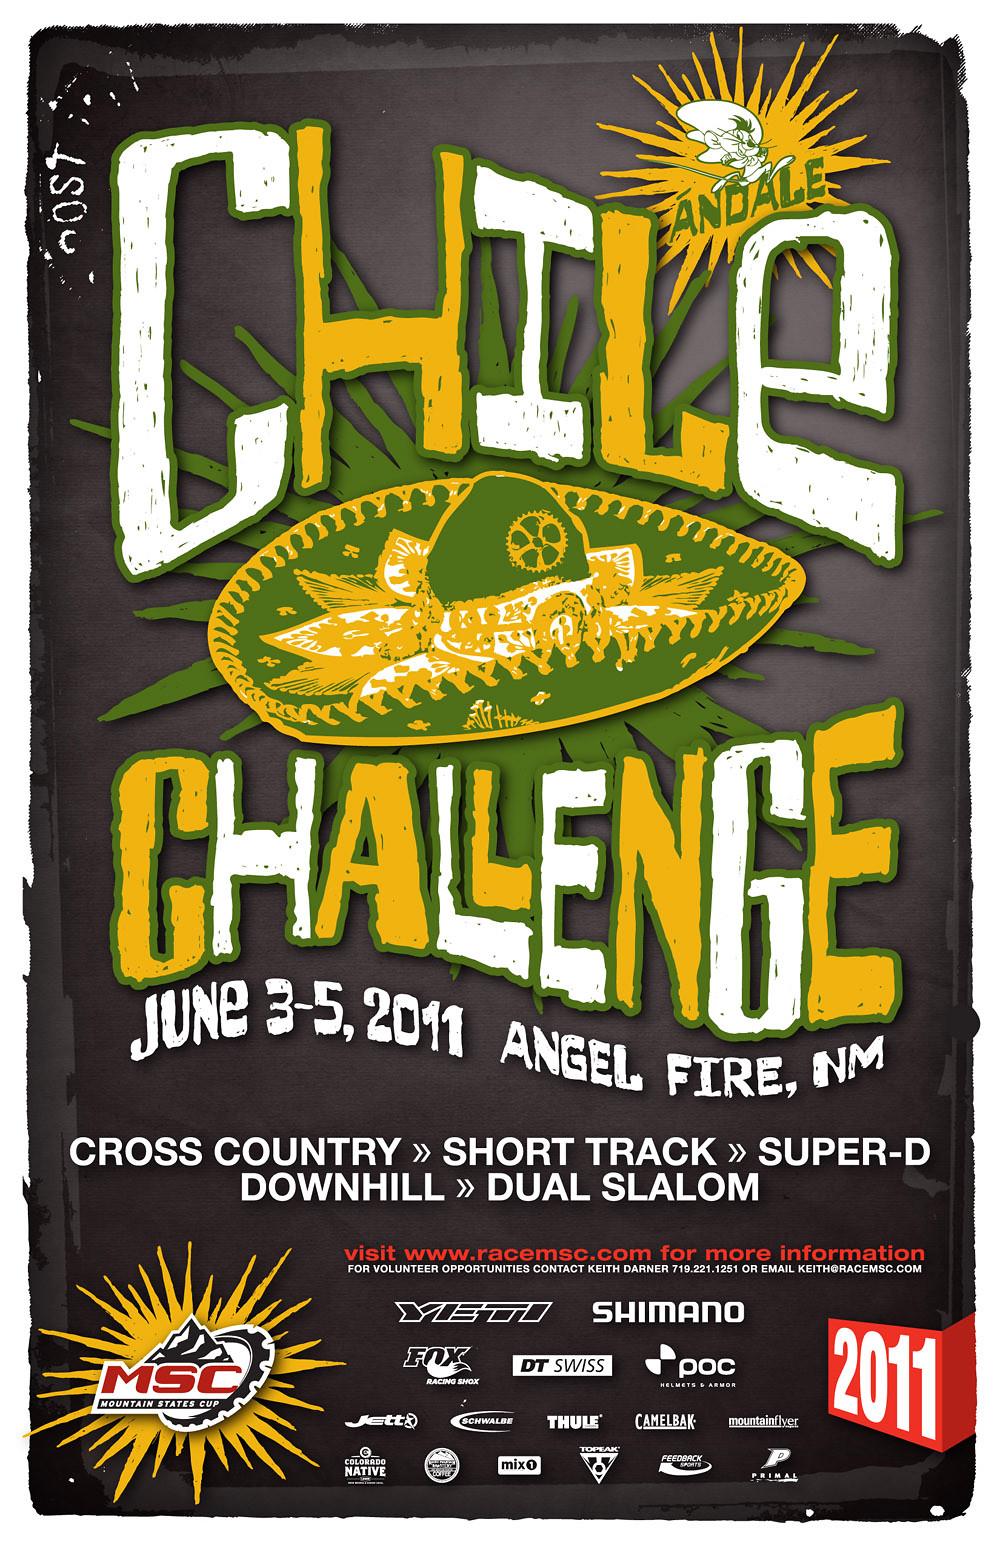 Chile Challenge poster 2011 FINAL - Full Trucker - Mountain Biking Pictures - Vital MTB